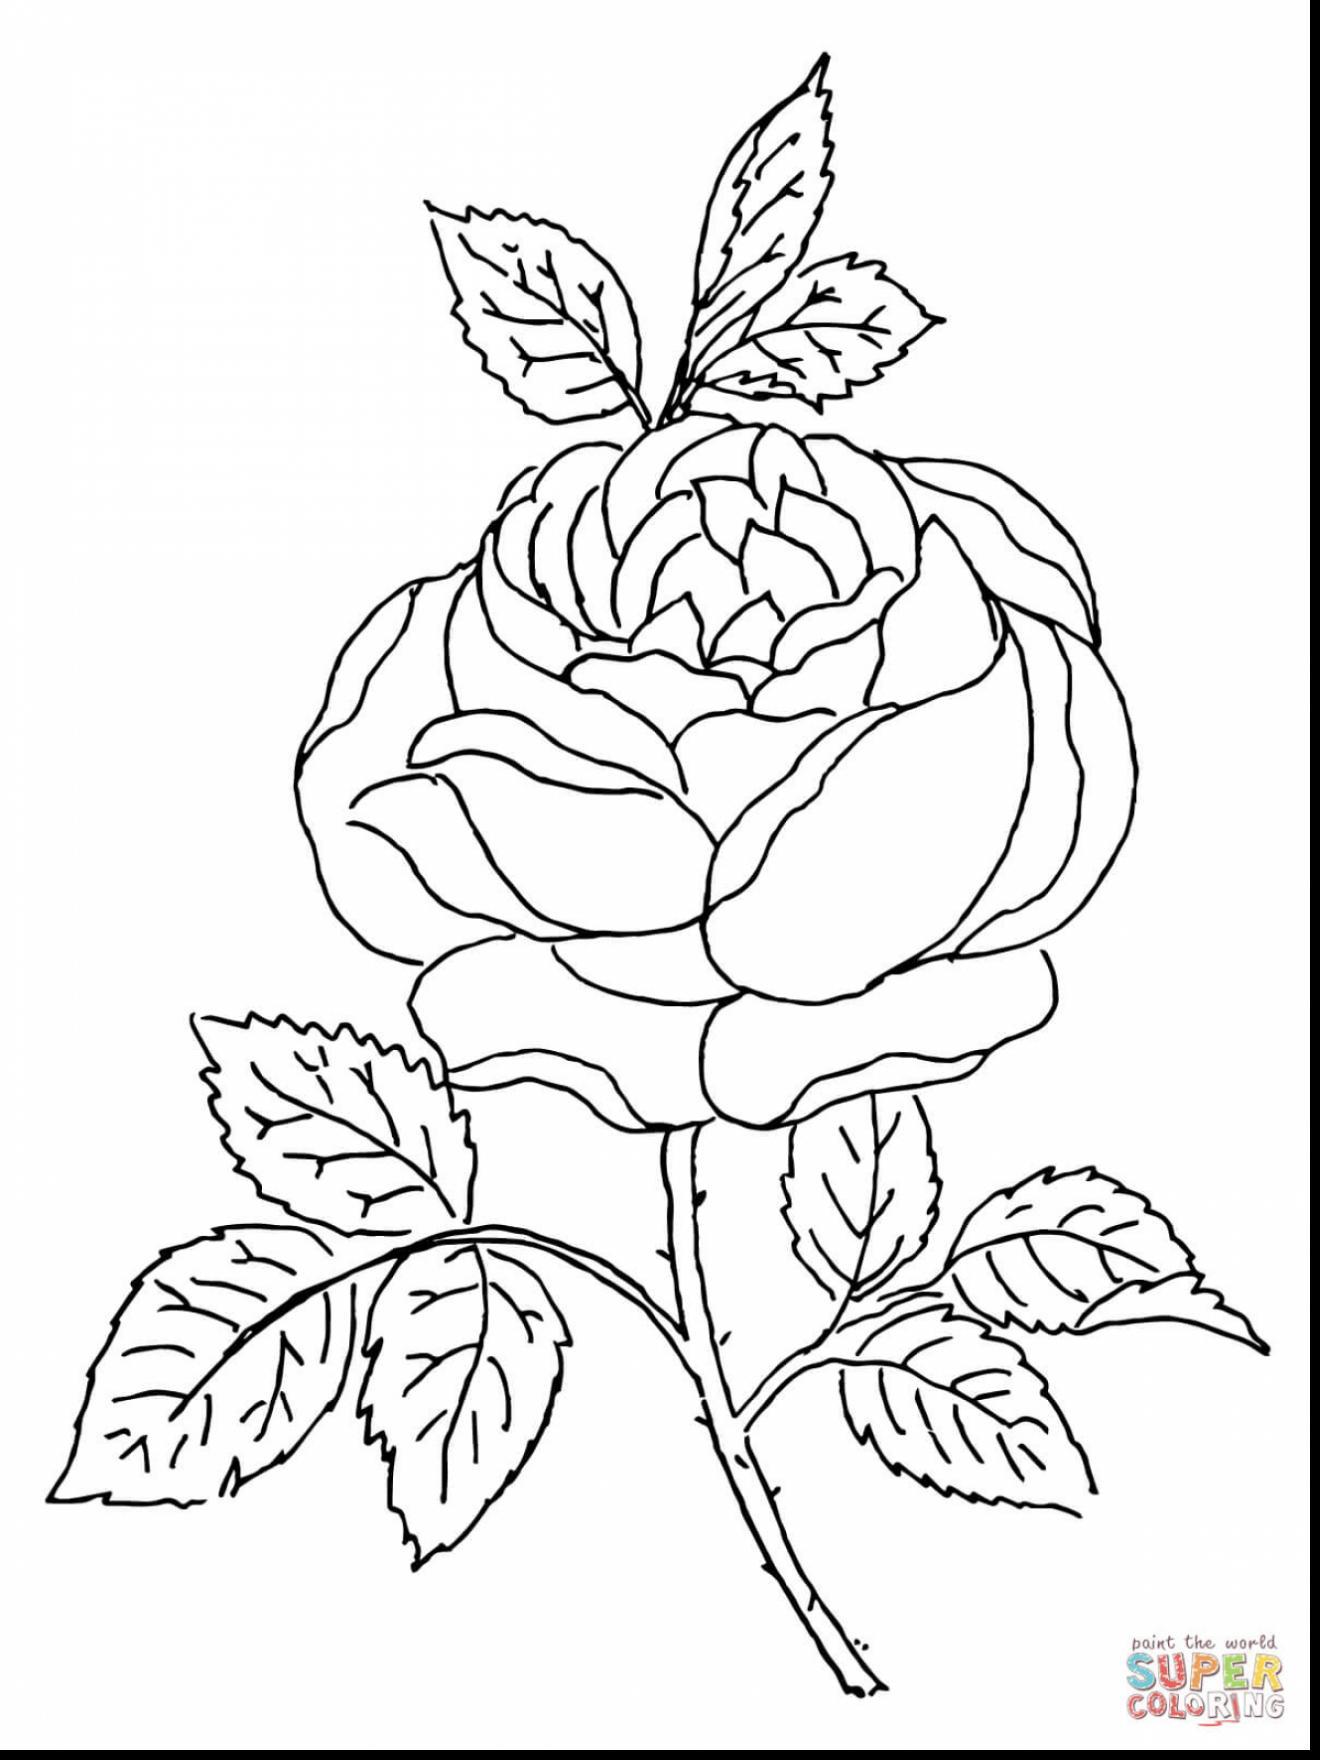 Skull Rose Drawing at GetDrawings.com | Free for personal use Skull ...